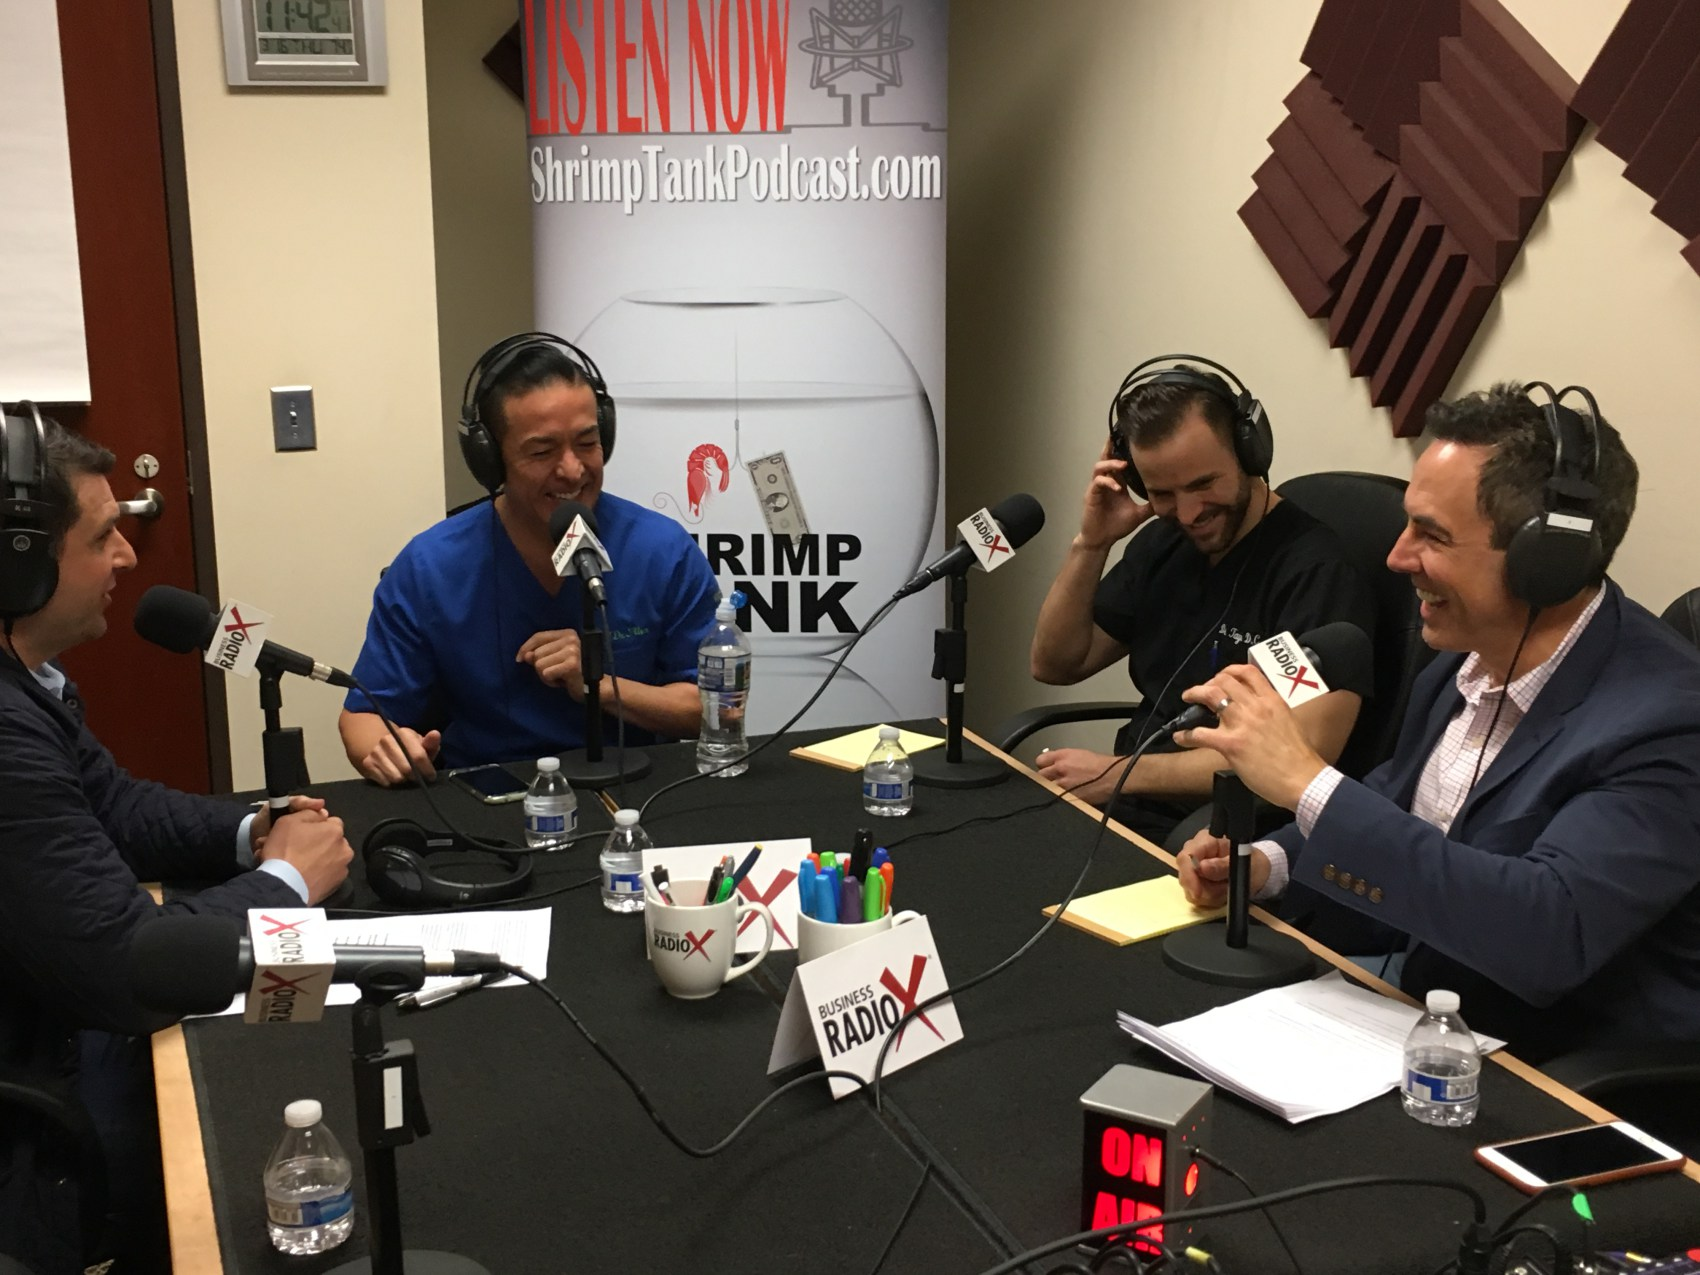 Dr. Alex Roig on Shrimp Tank Podcast